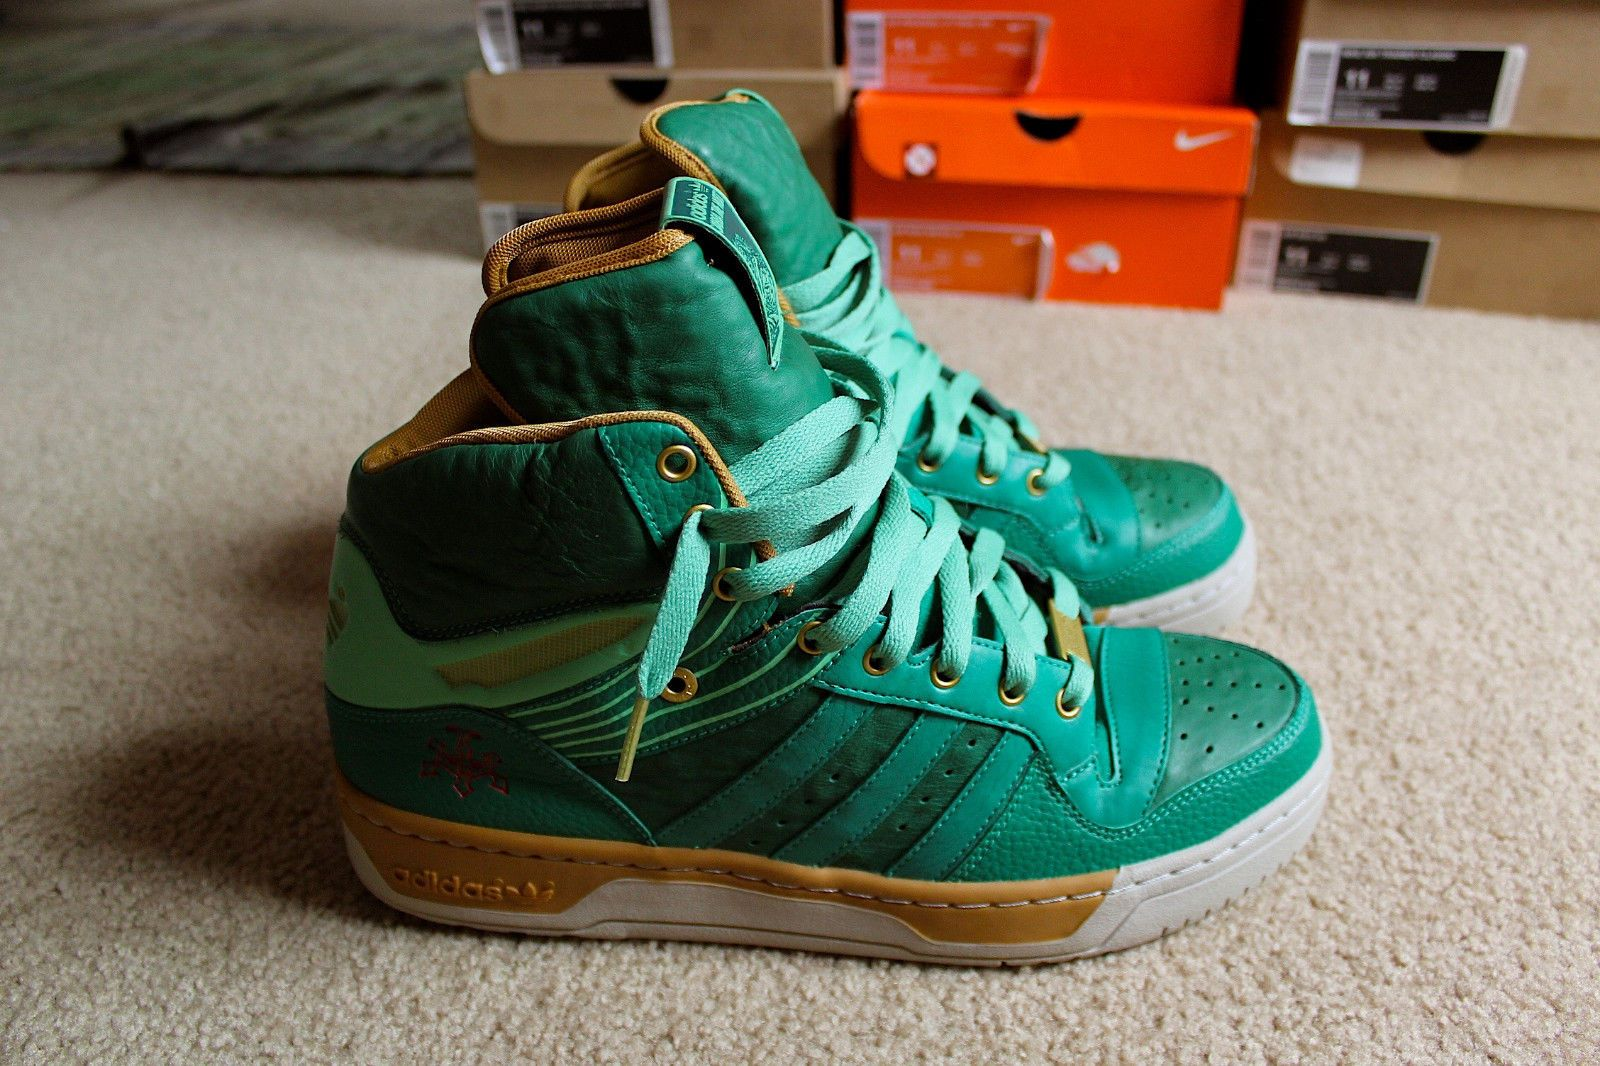 Nmd Wars Jabba Ds M Star The Adidas Originals Attitude Boost Hut b76gyYf